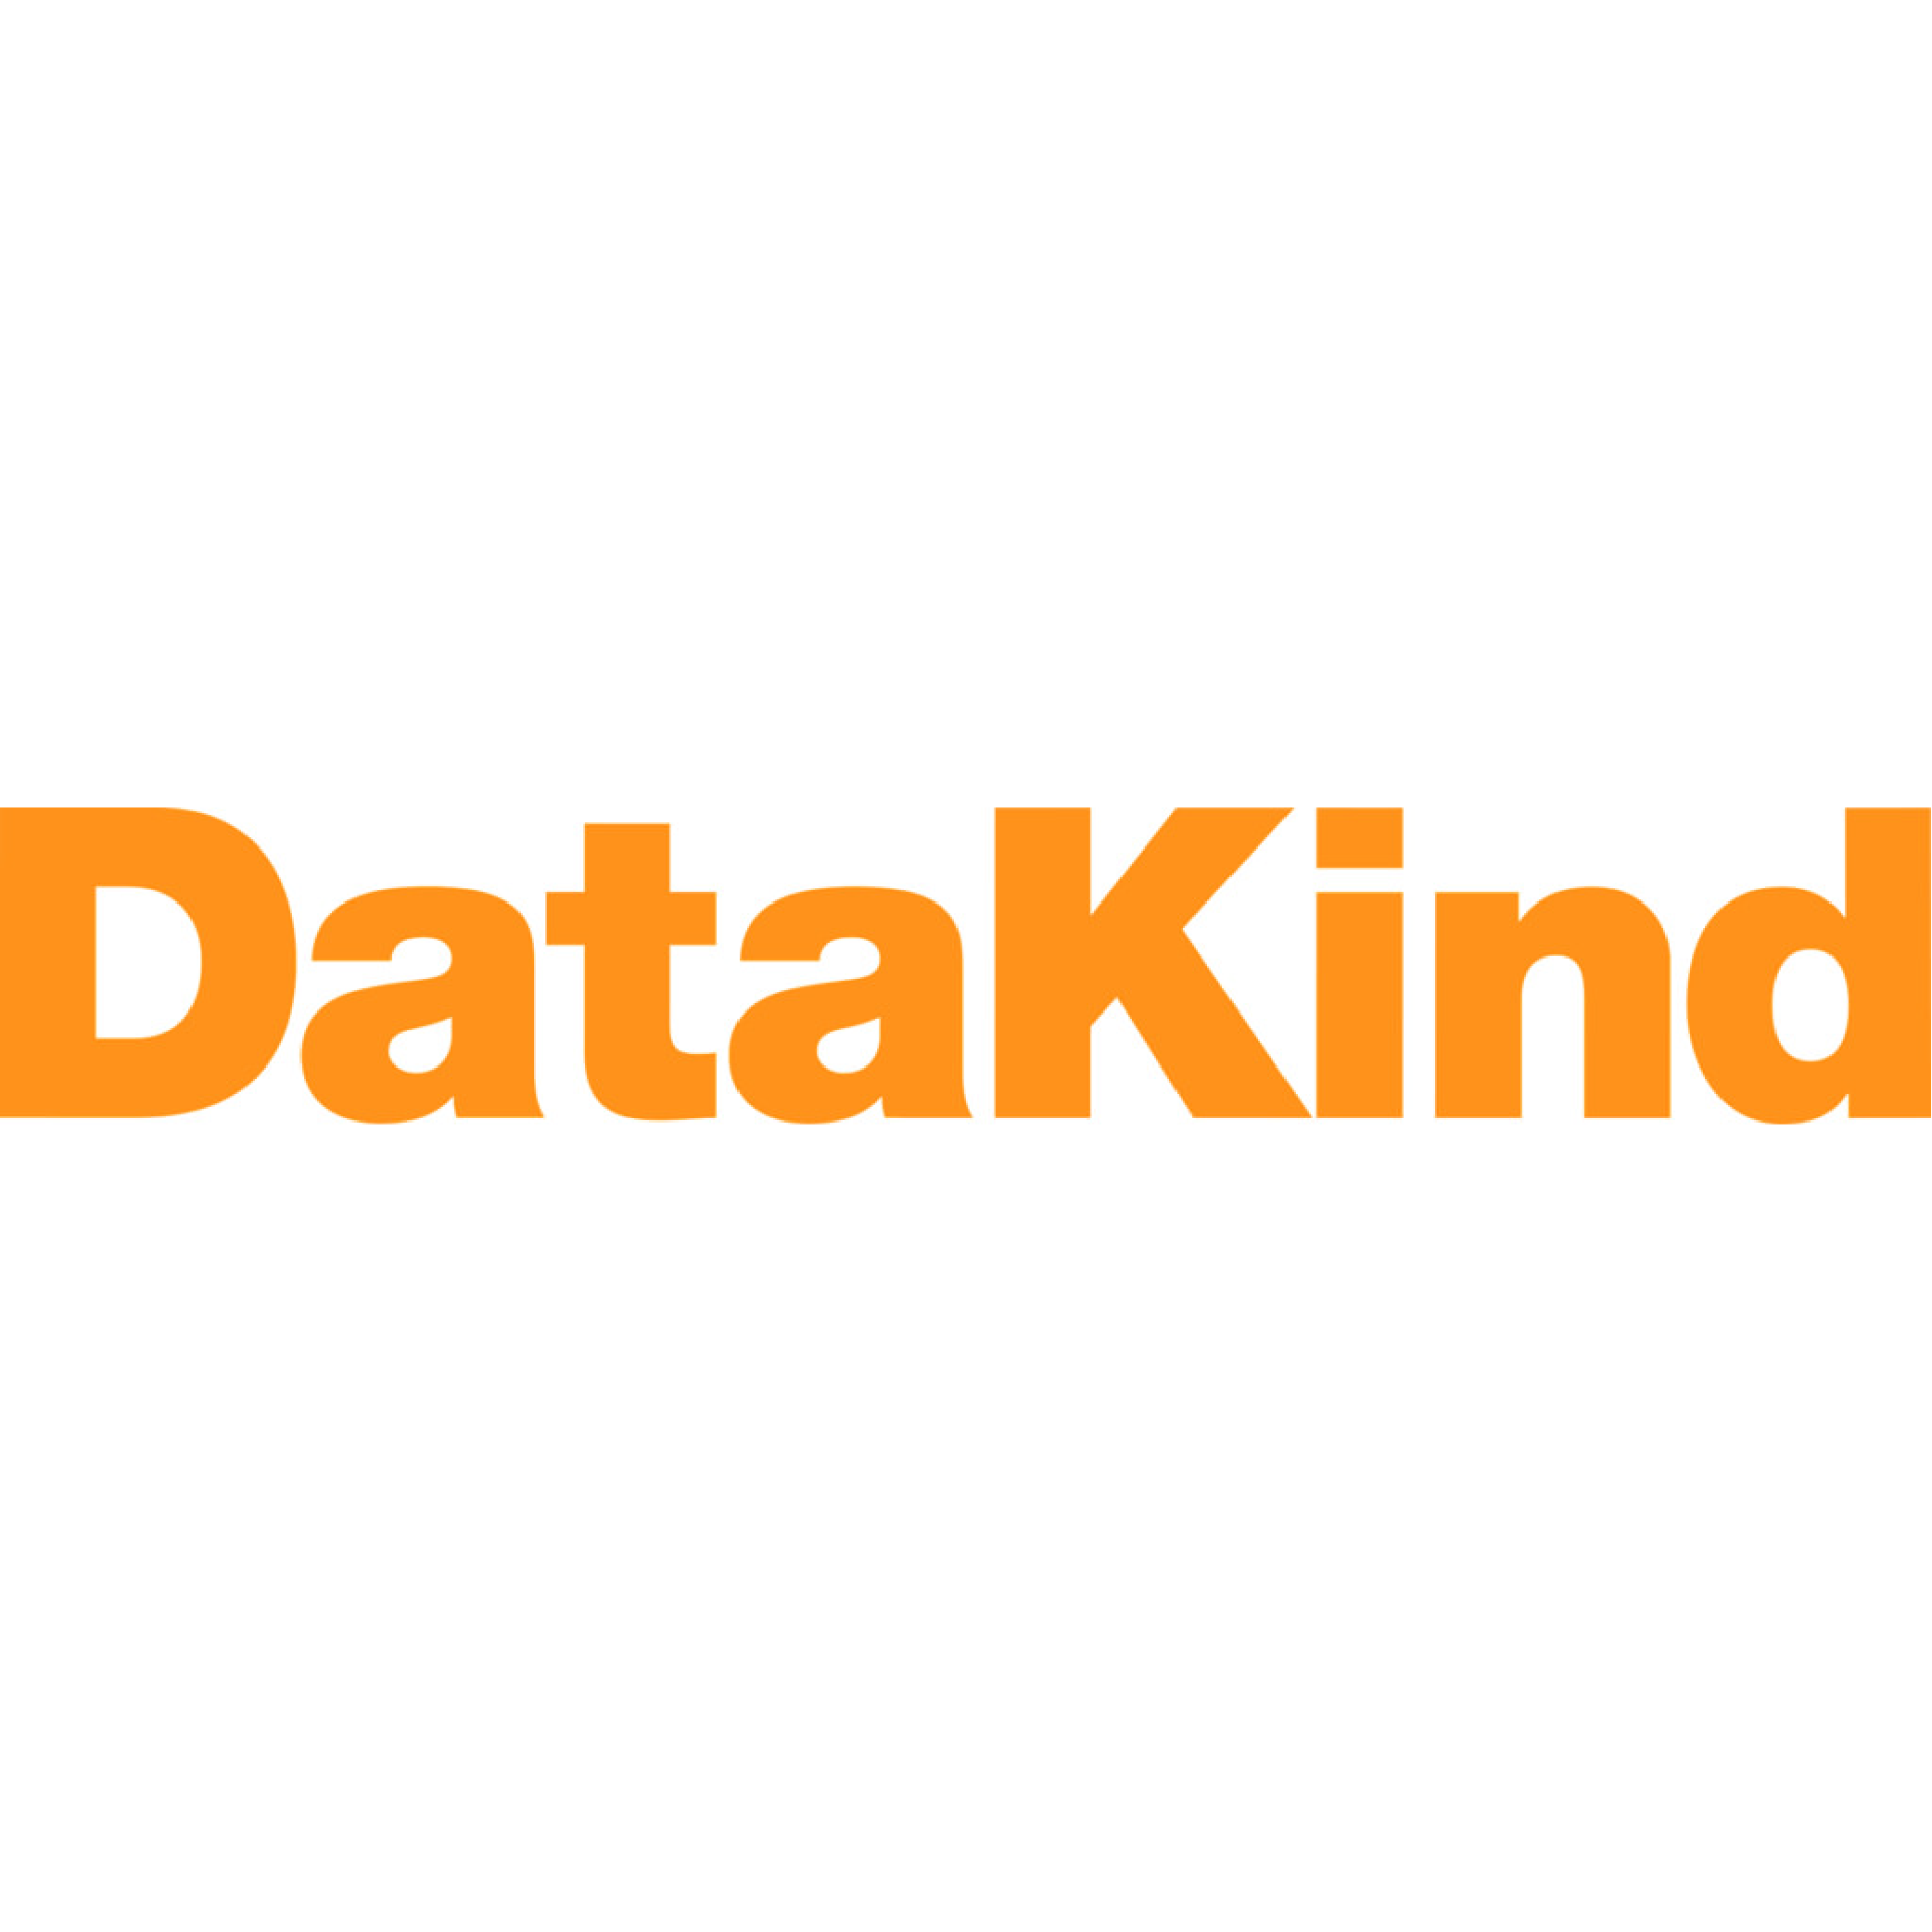 DataKind logo